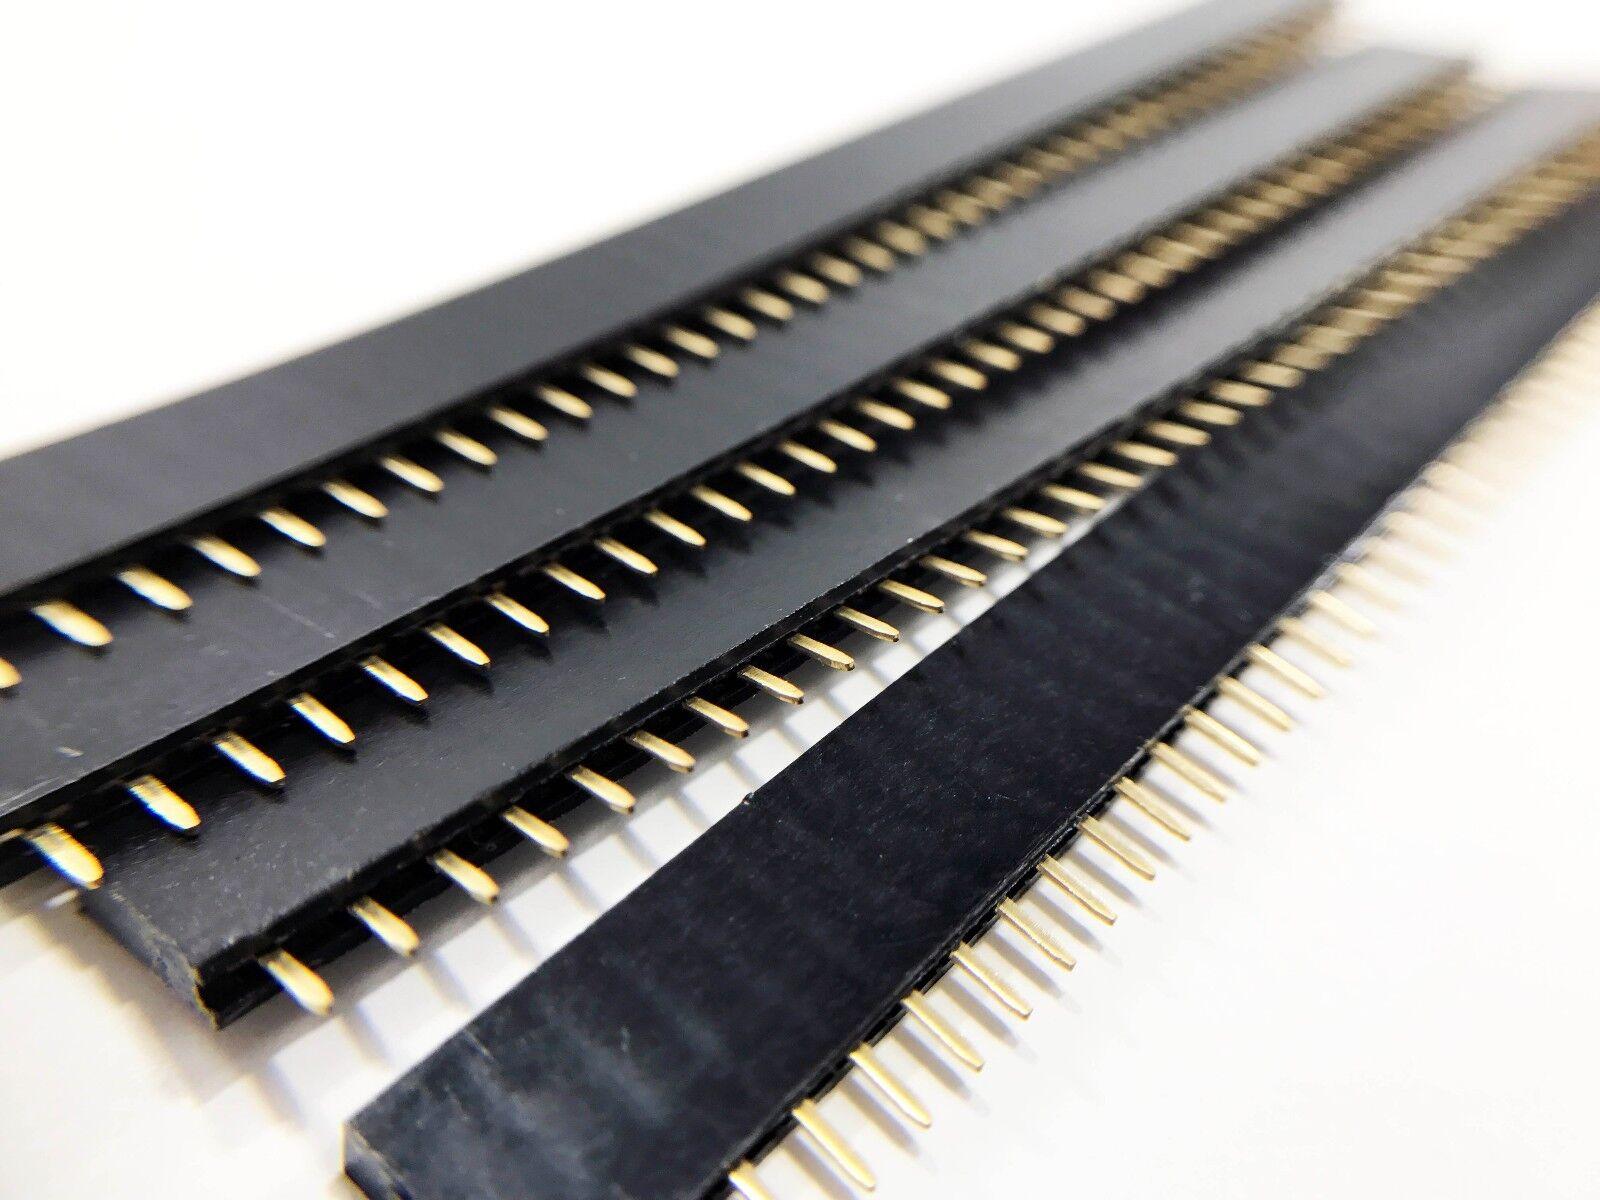 40pin Pcb Header Strip Male//Female Connectors 1x40 Pin SIL Single Row